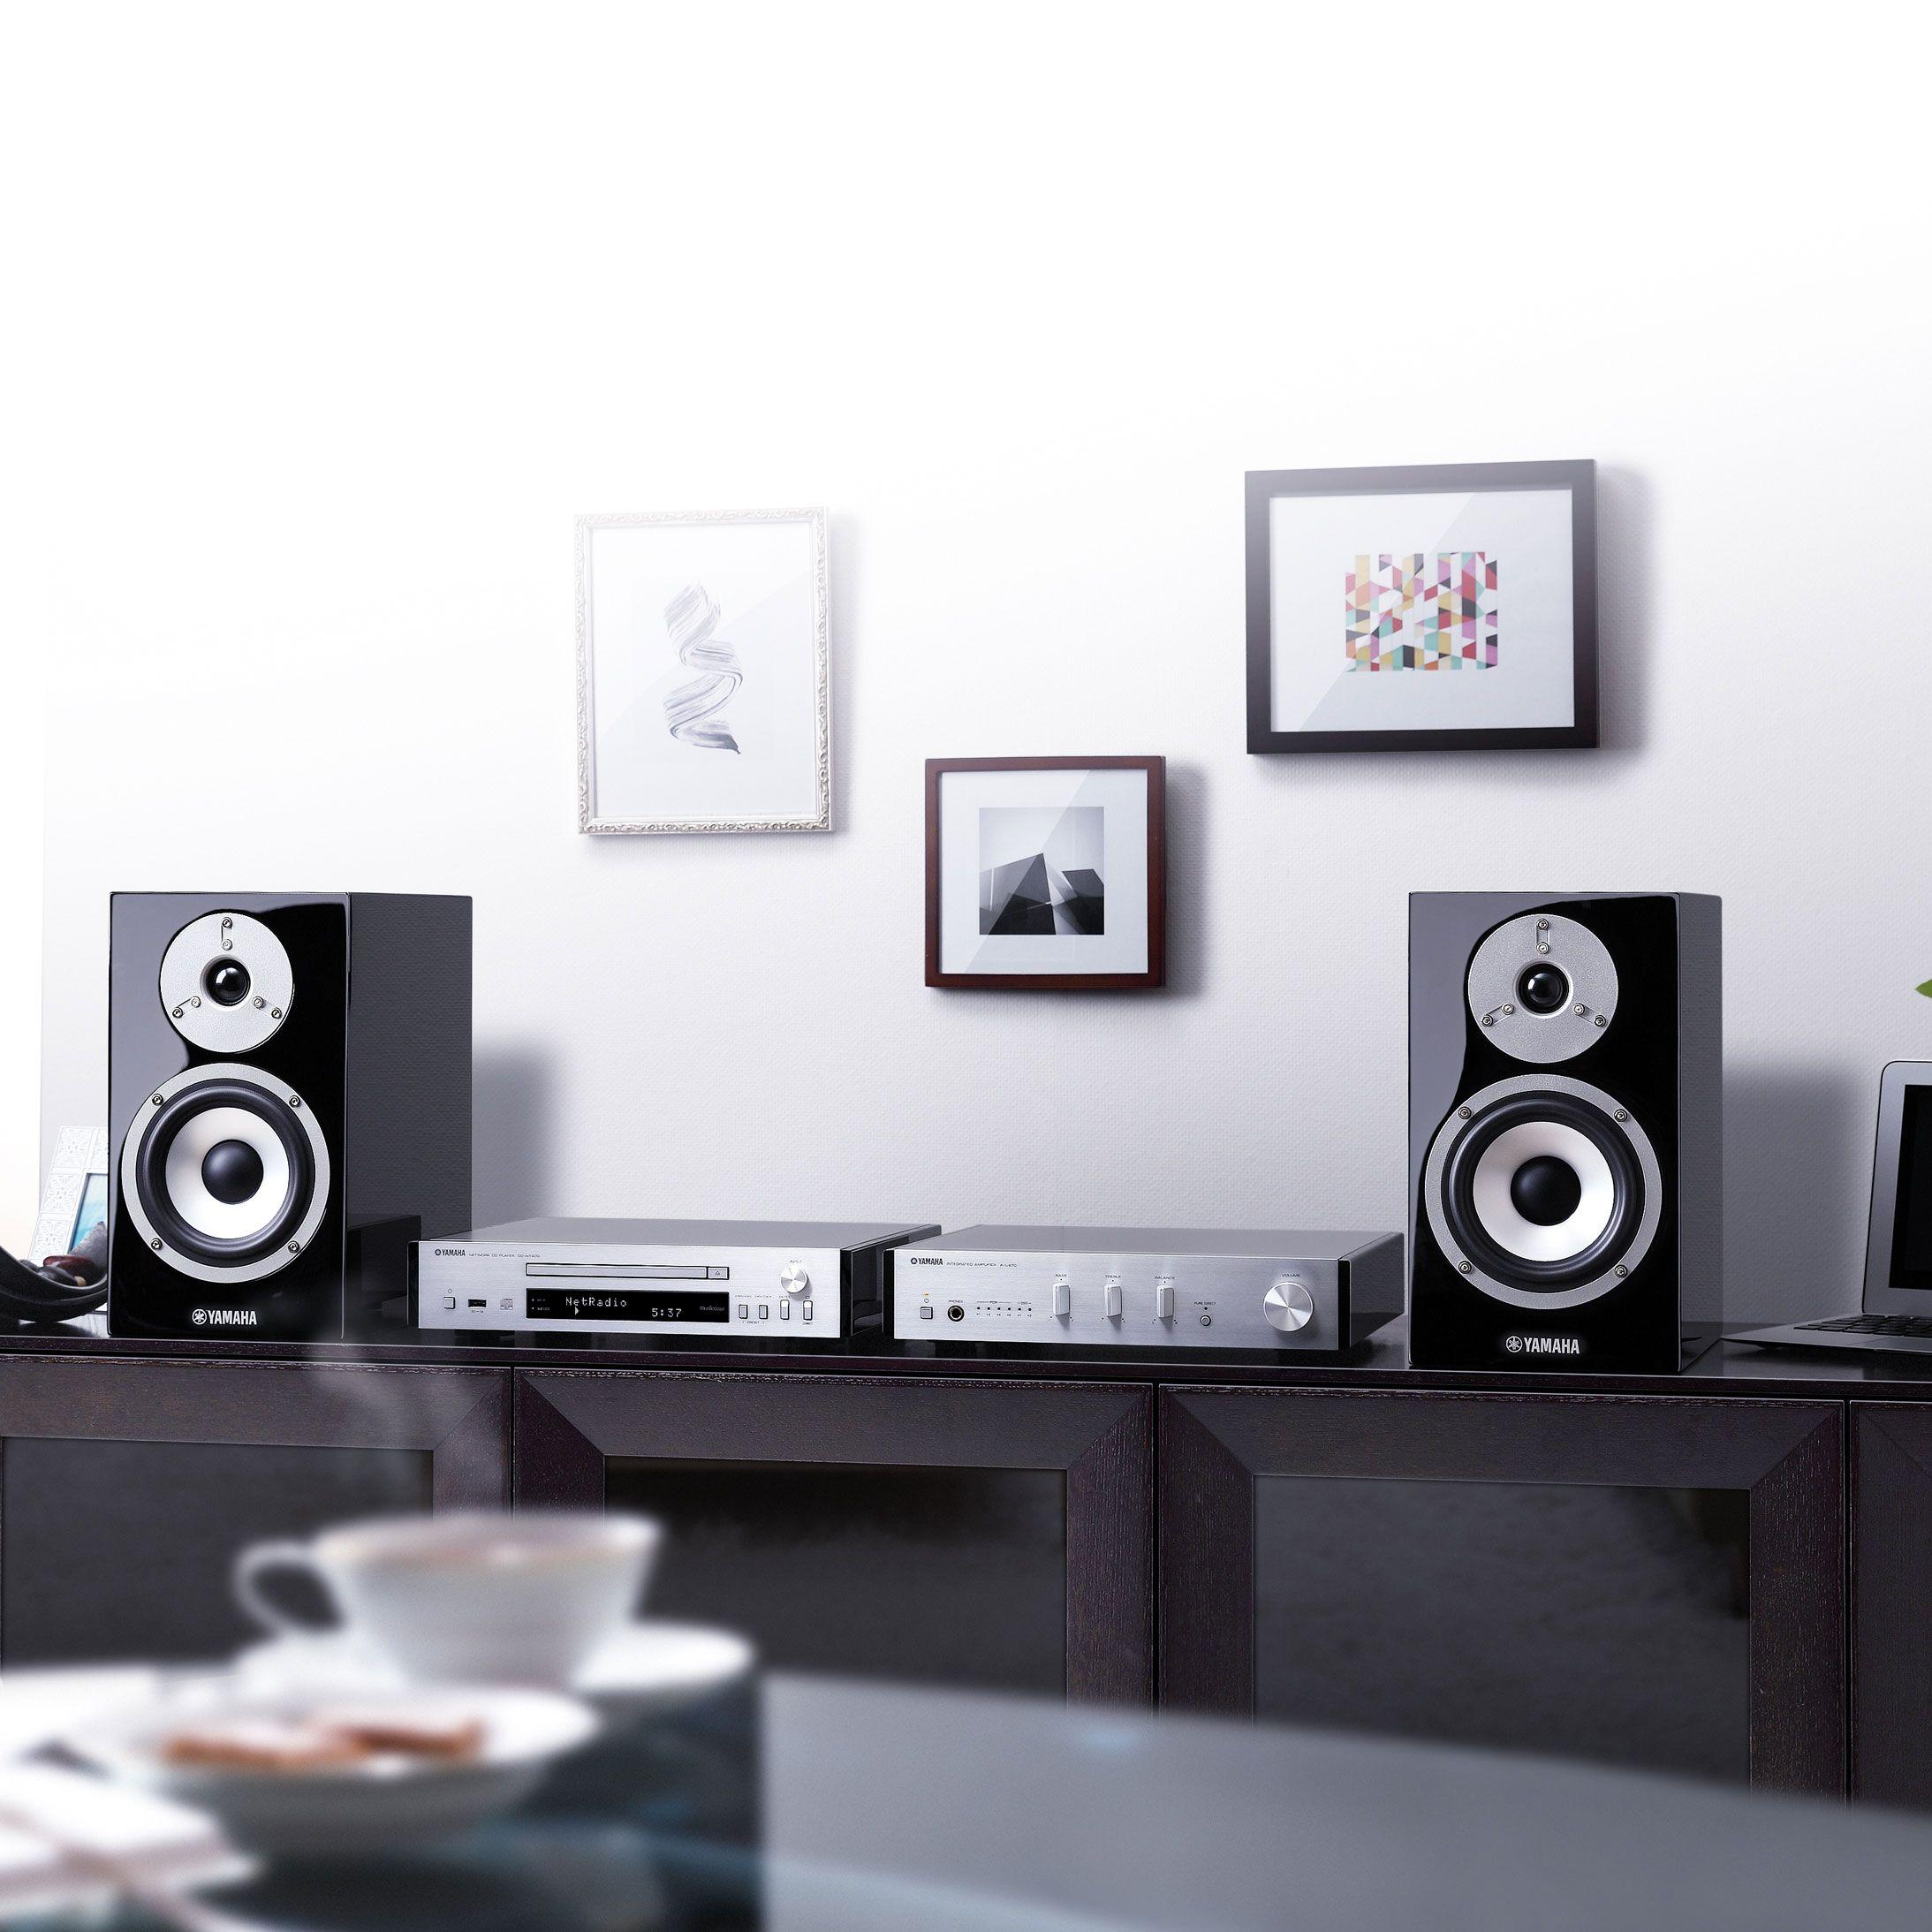 MCR-N870D MusicCast by Yamaha   MusicCast - Stream Network